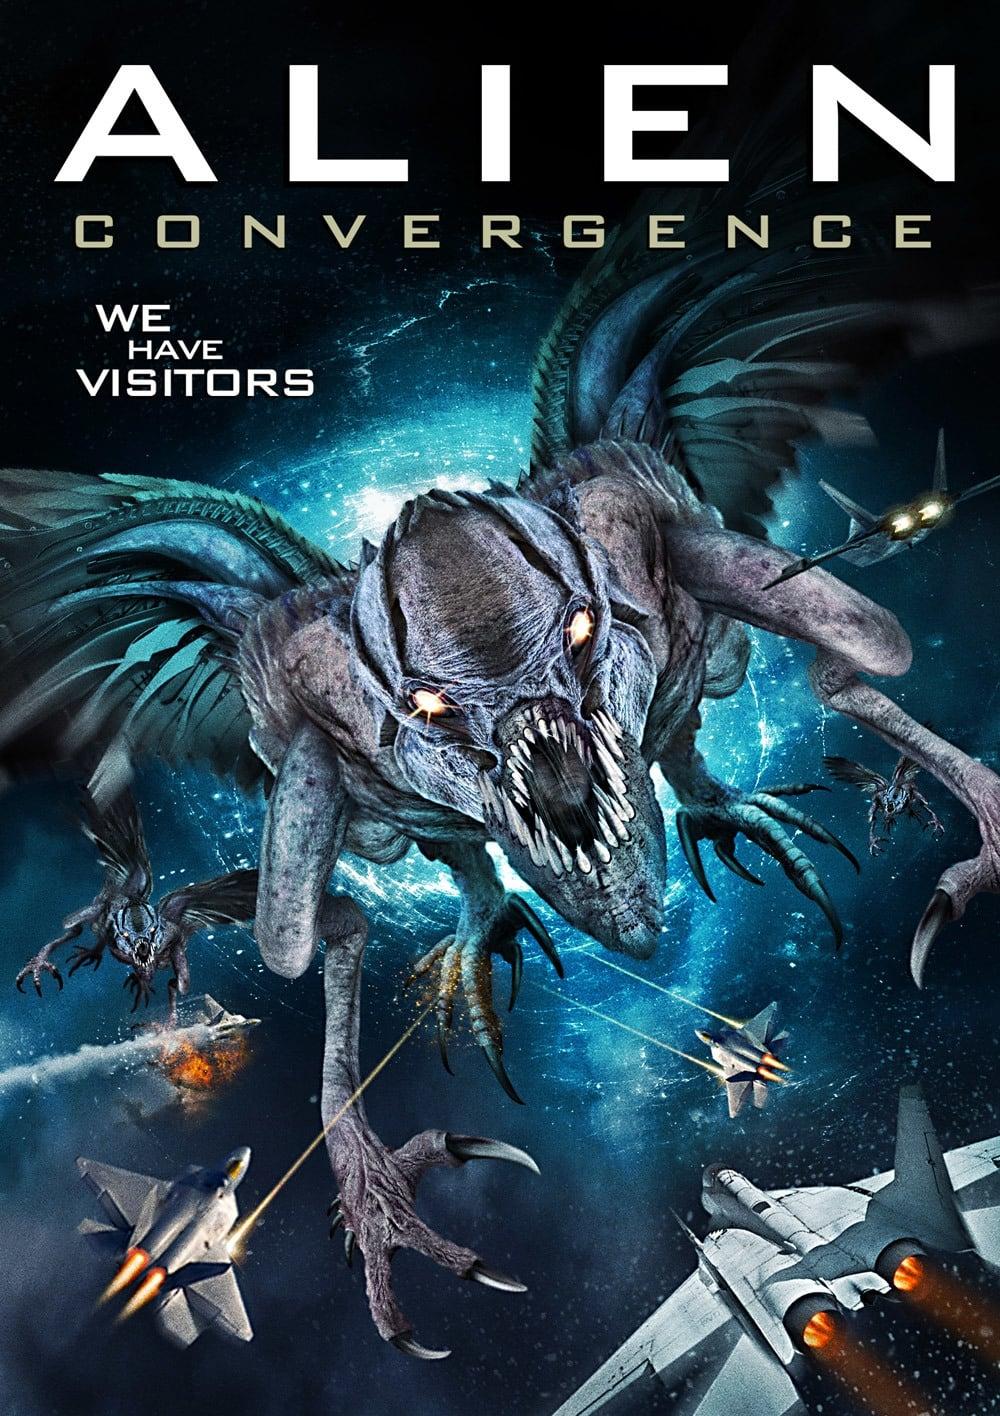 Assistir Alien Convergence Legendado Online Legendado 1080p